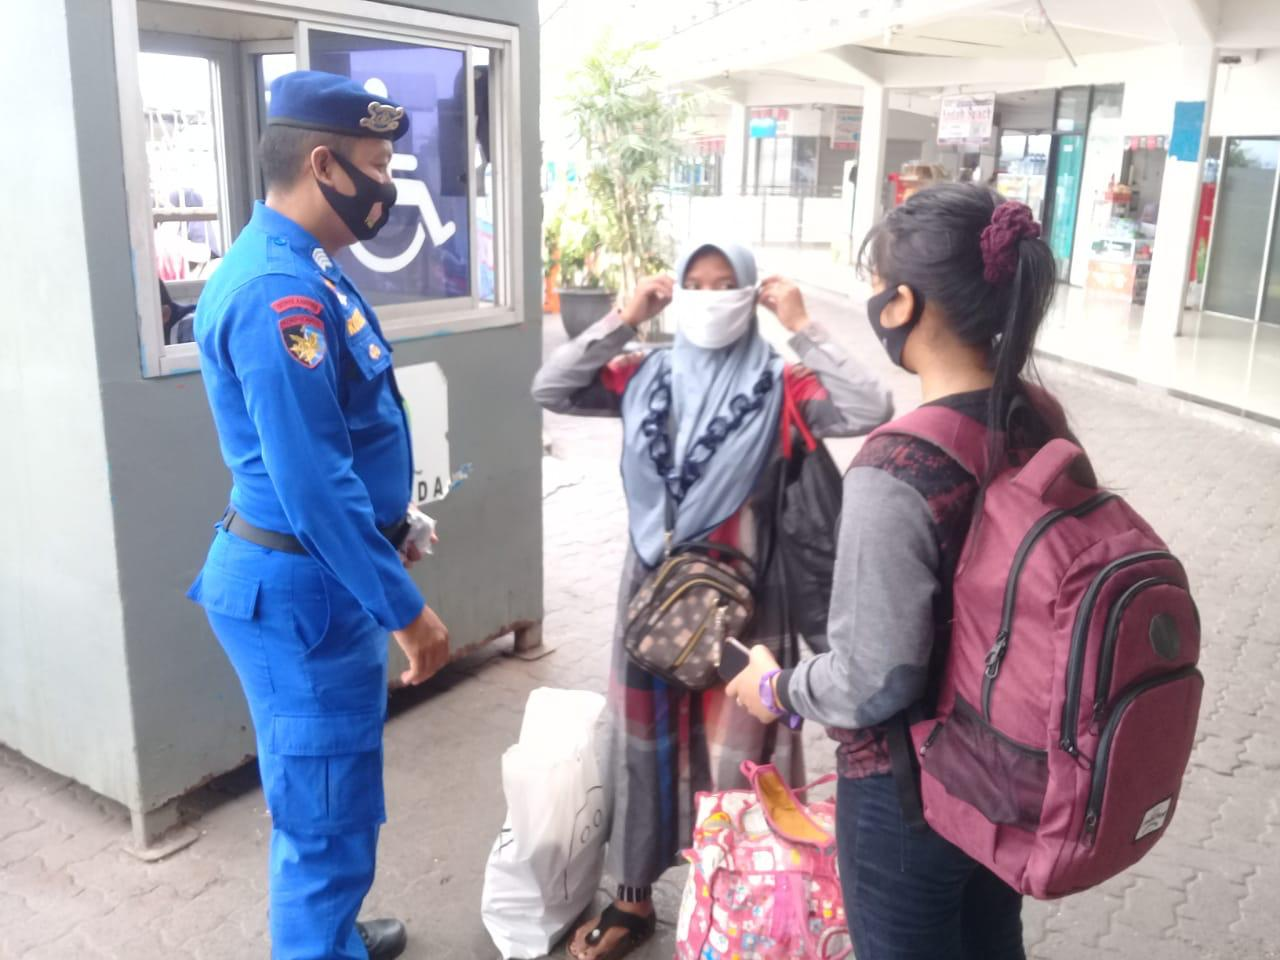 Ditpolairud Polda Banten Bagikan Ratusan Masker di Pelabuhan Merak